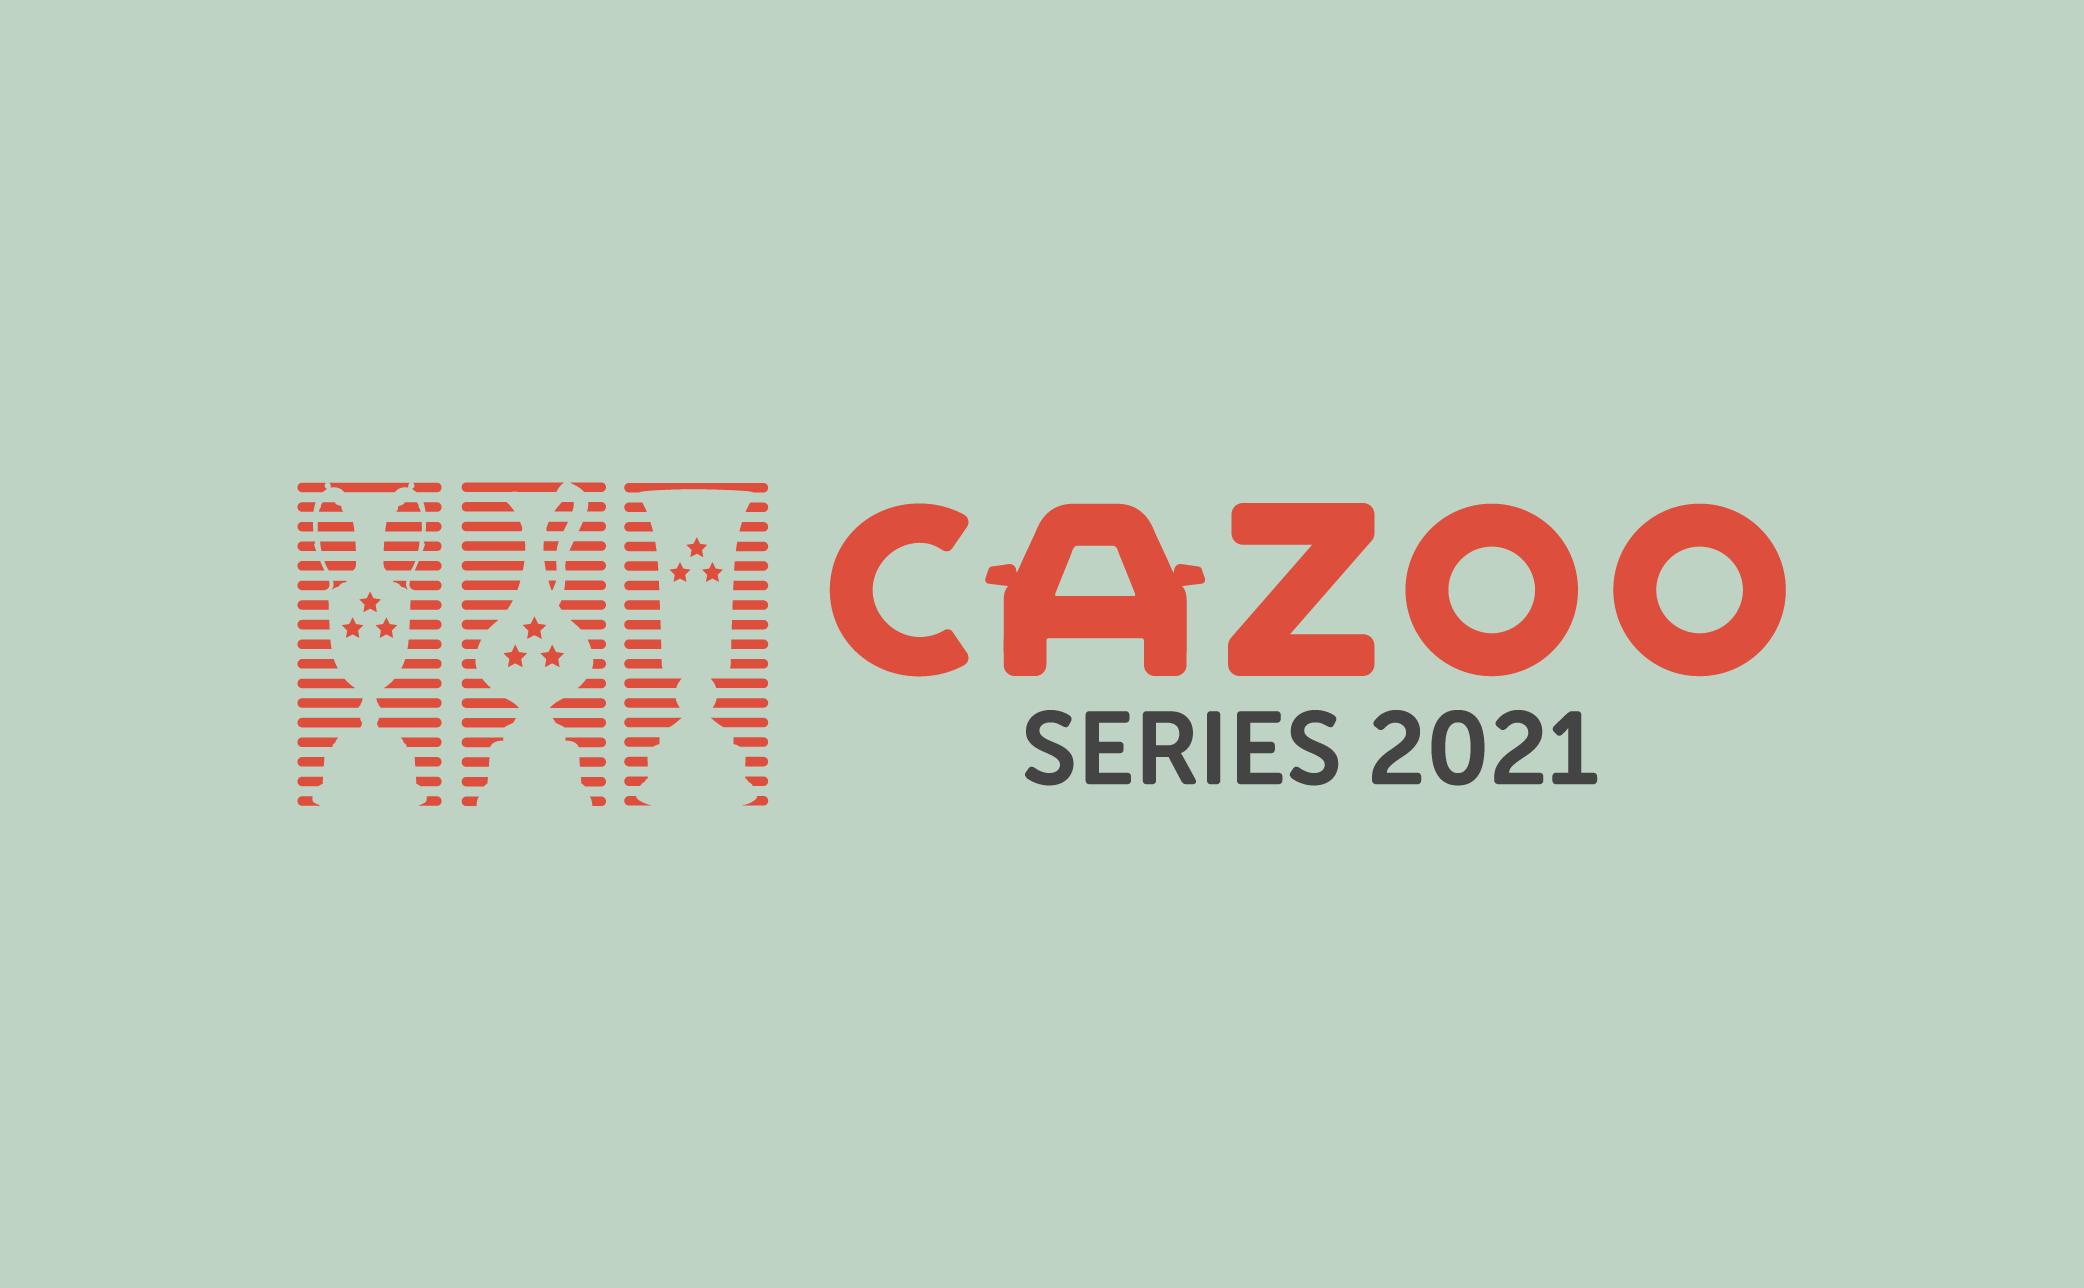 Cazoo World Snooker Tour Sponsorship